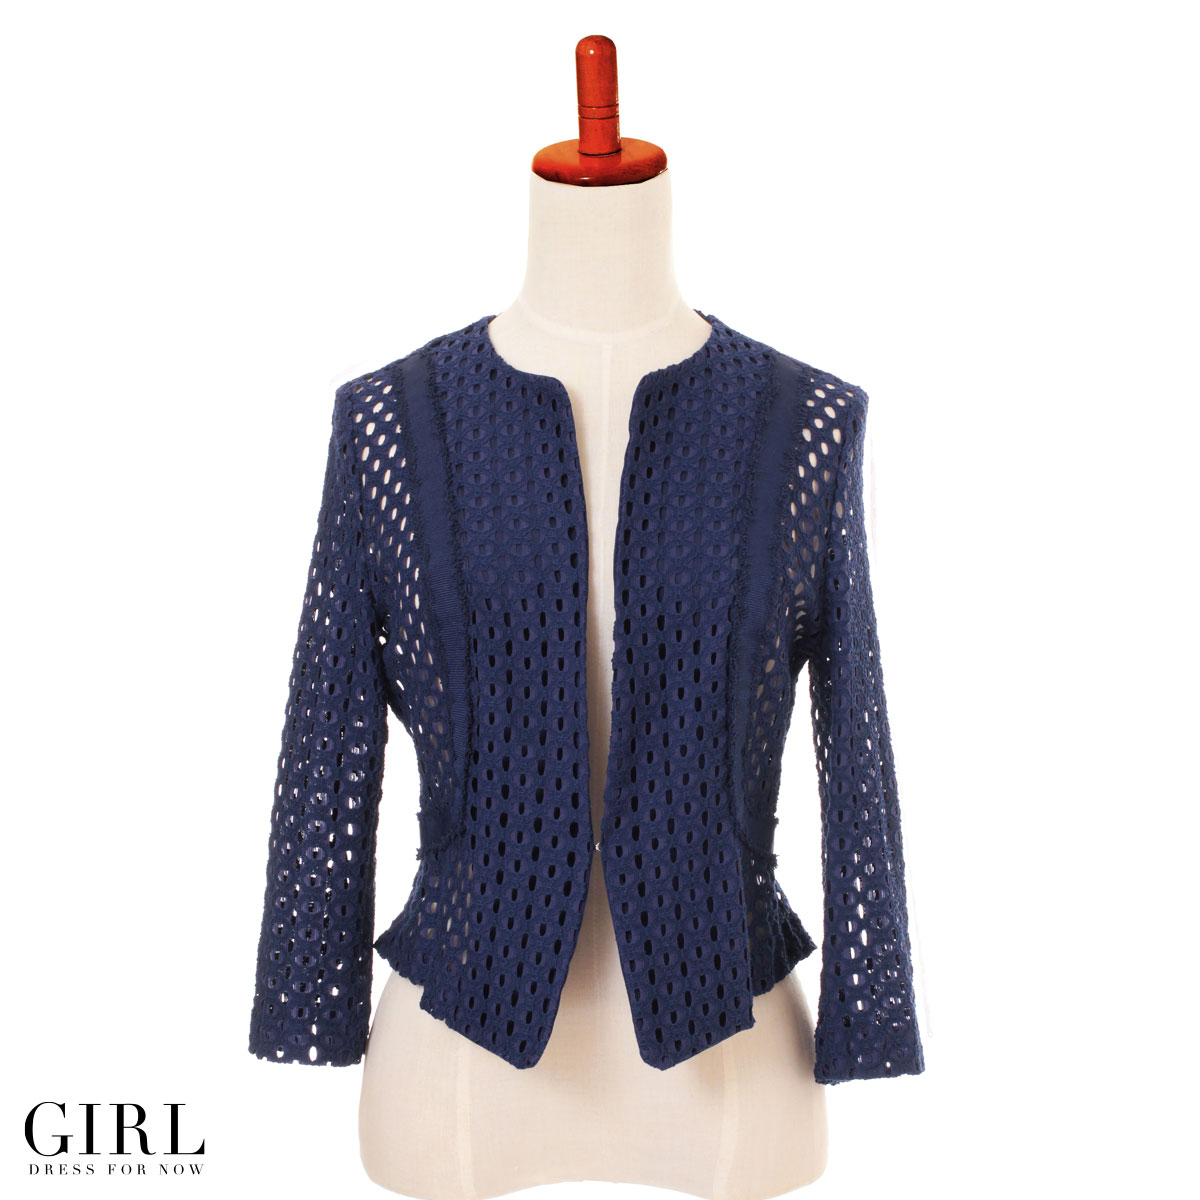 Dress shop GIRL   Rakuten Global Market: Bolero jacket wedding ...